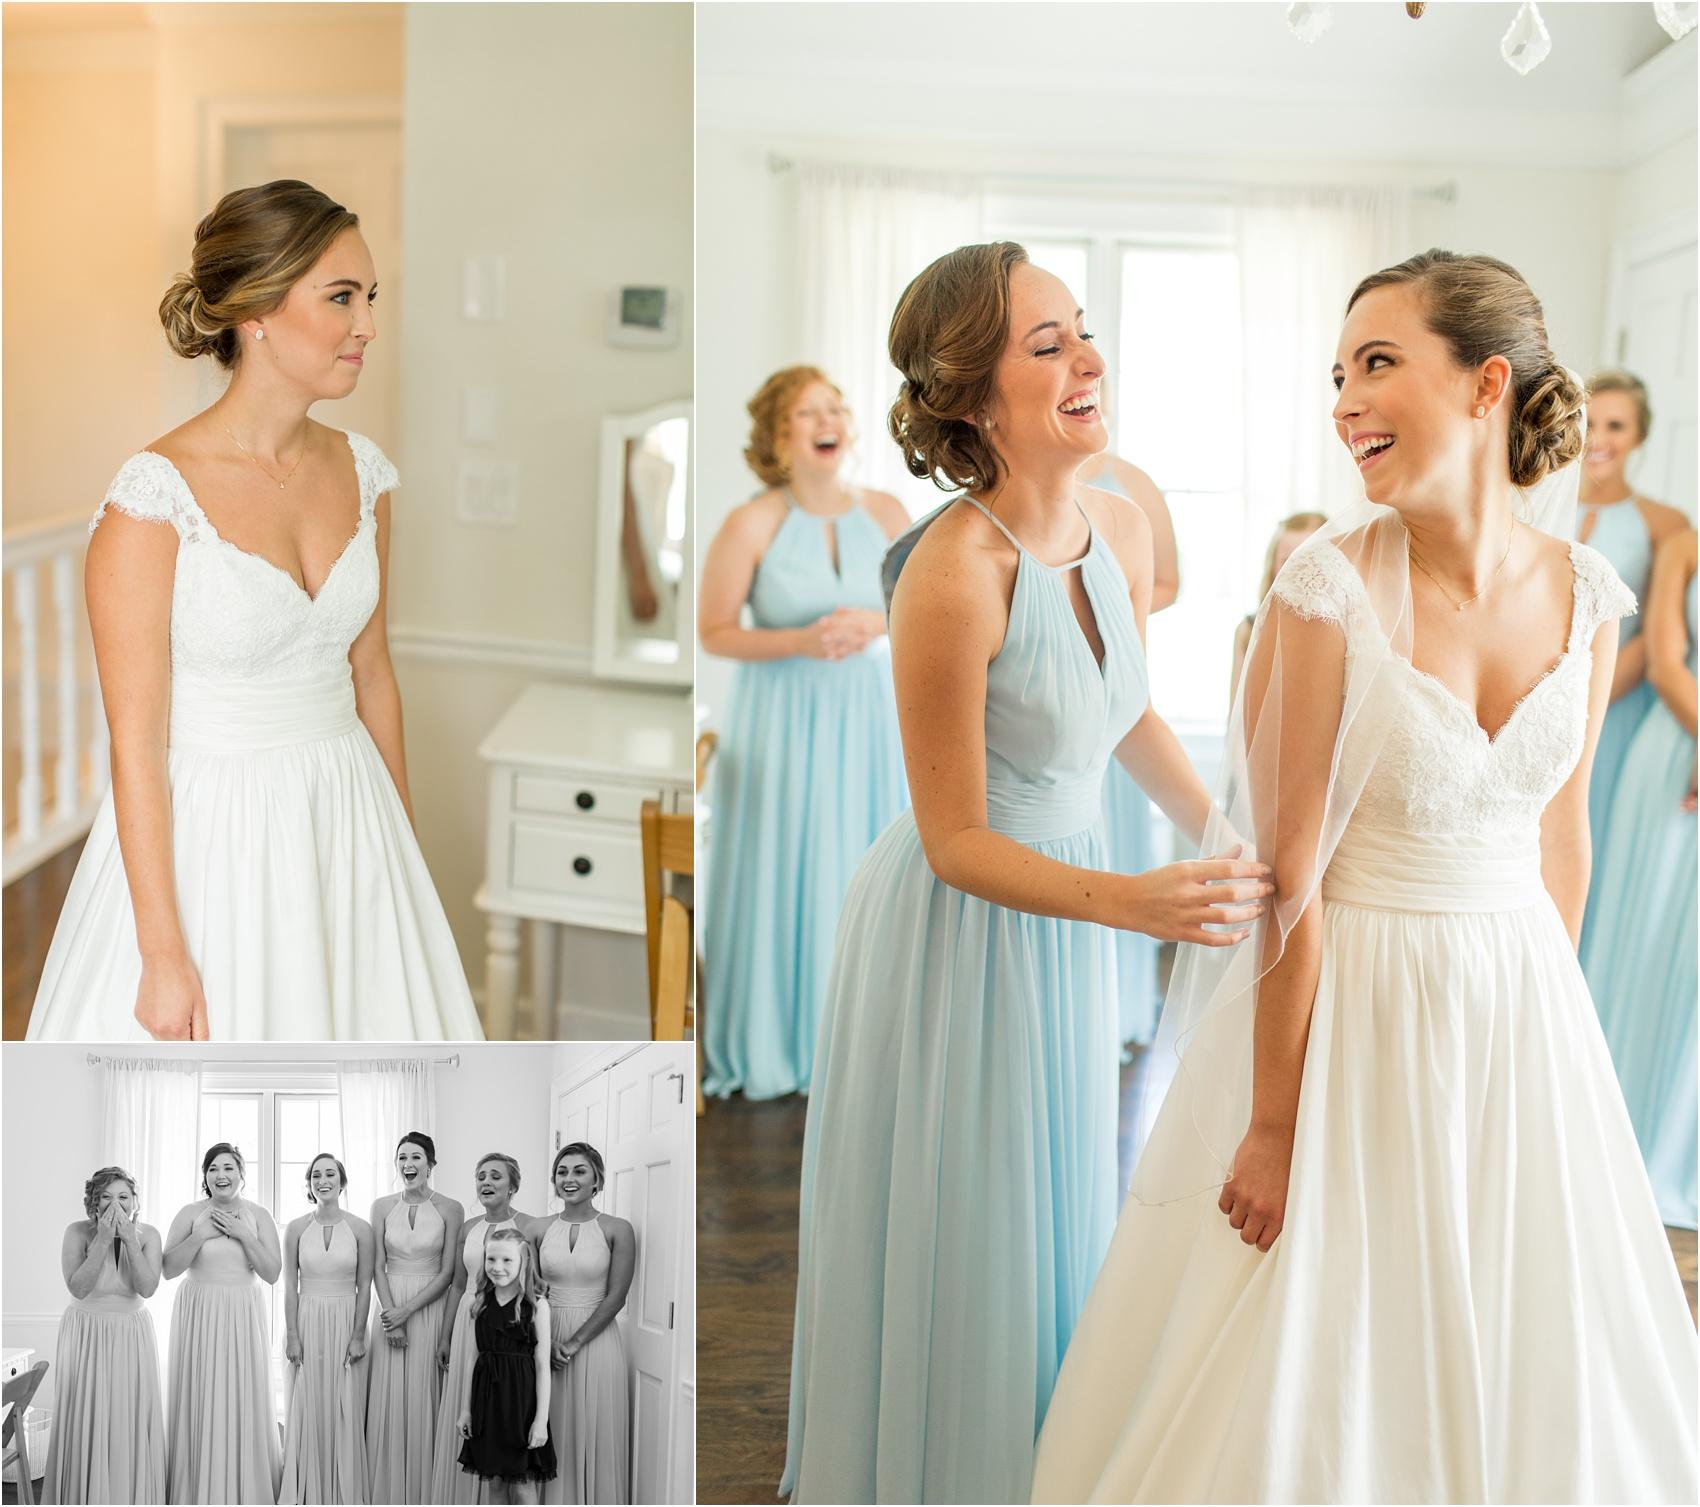 Savannah Eve Photography- Sigl-Adams Wedding- Sneak Peek-10.jpg